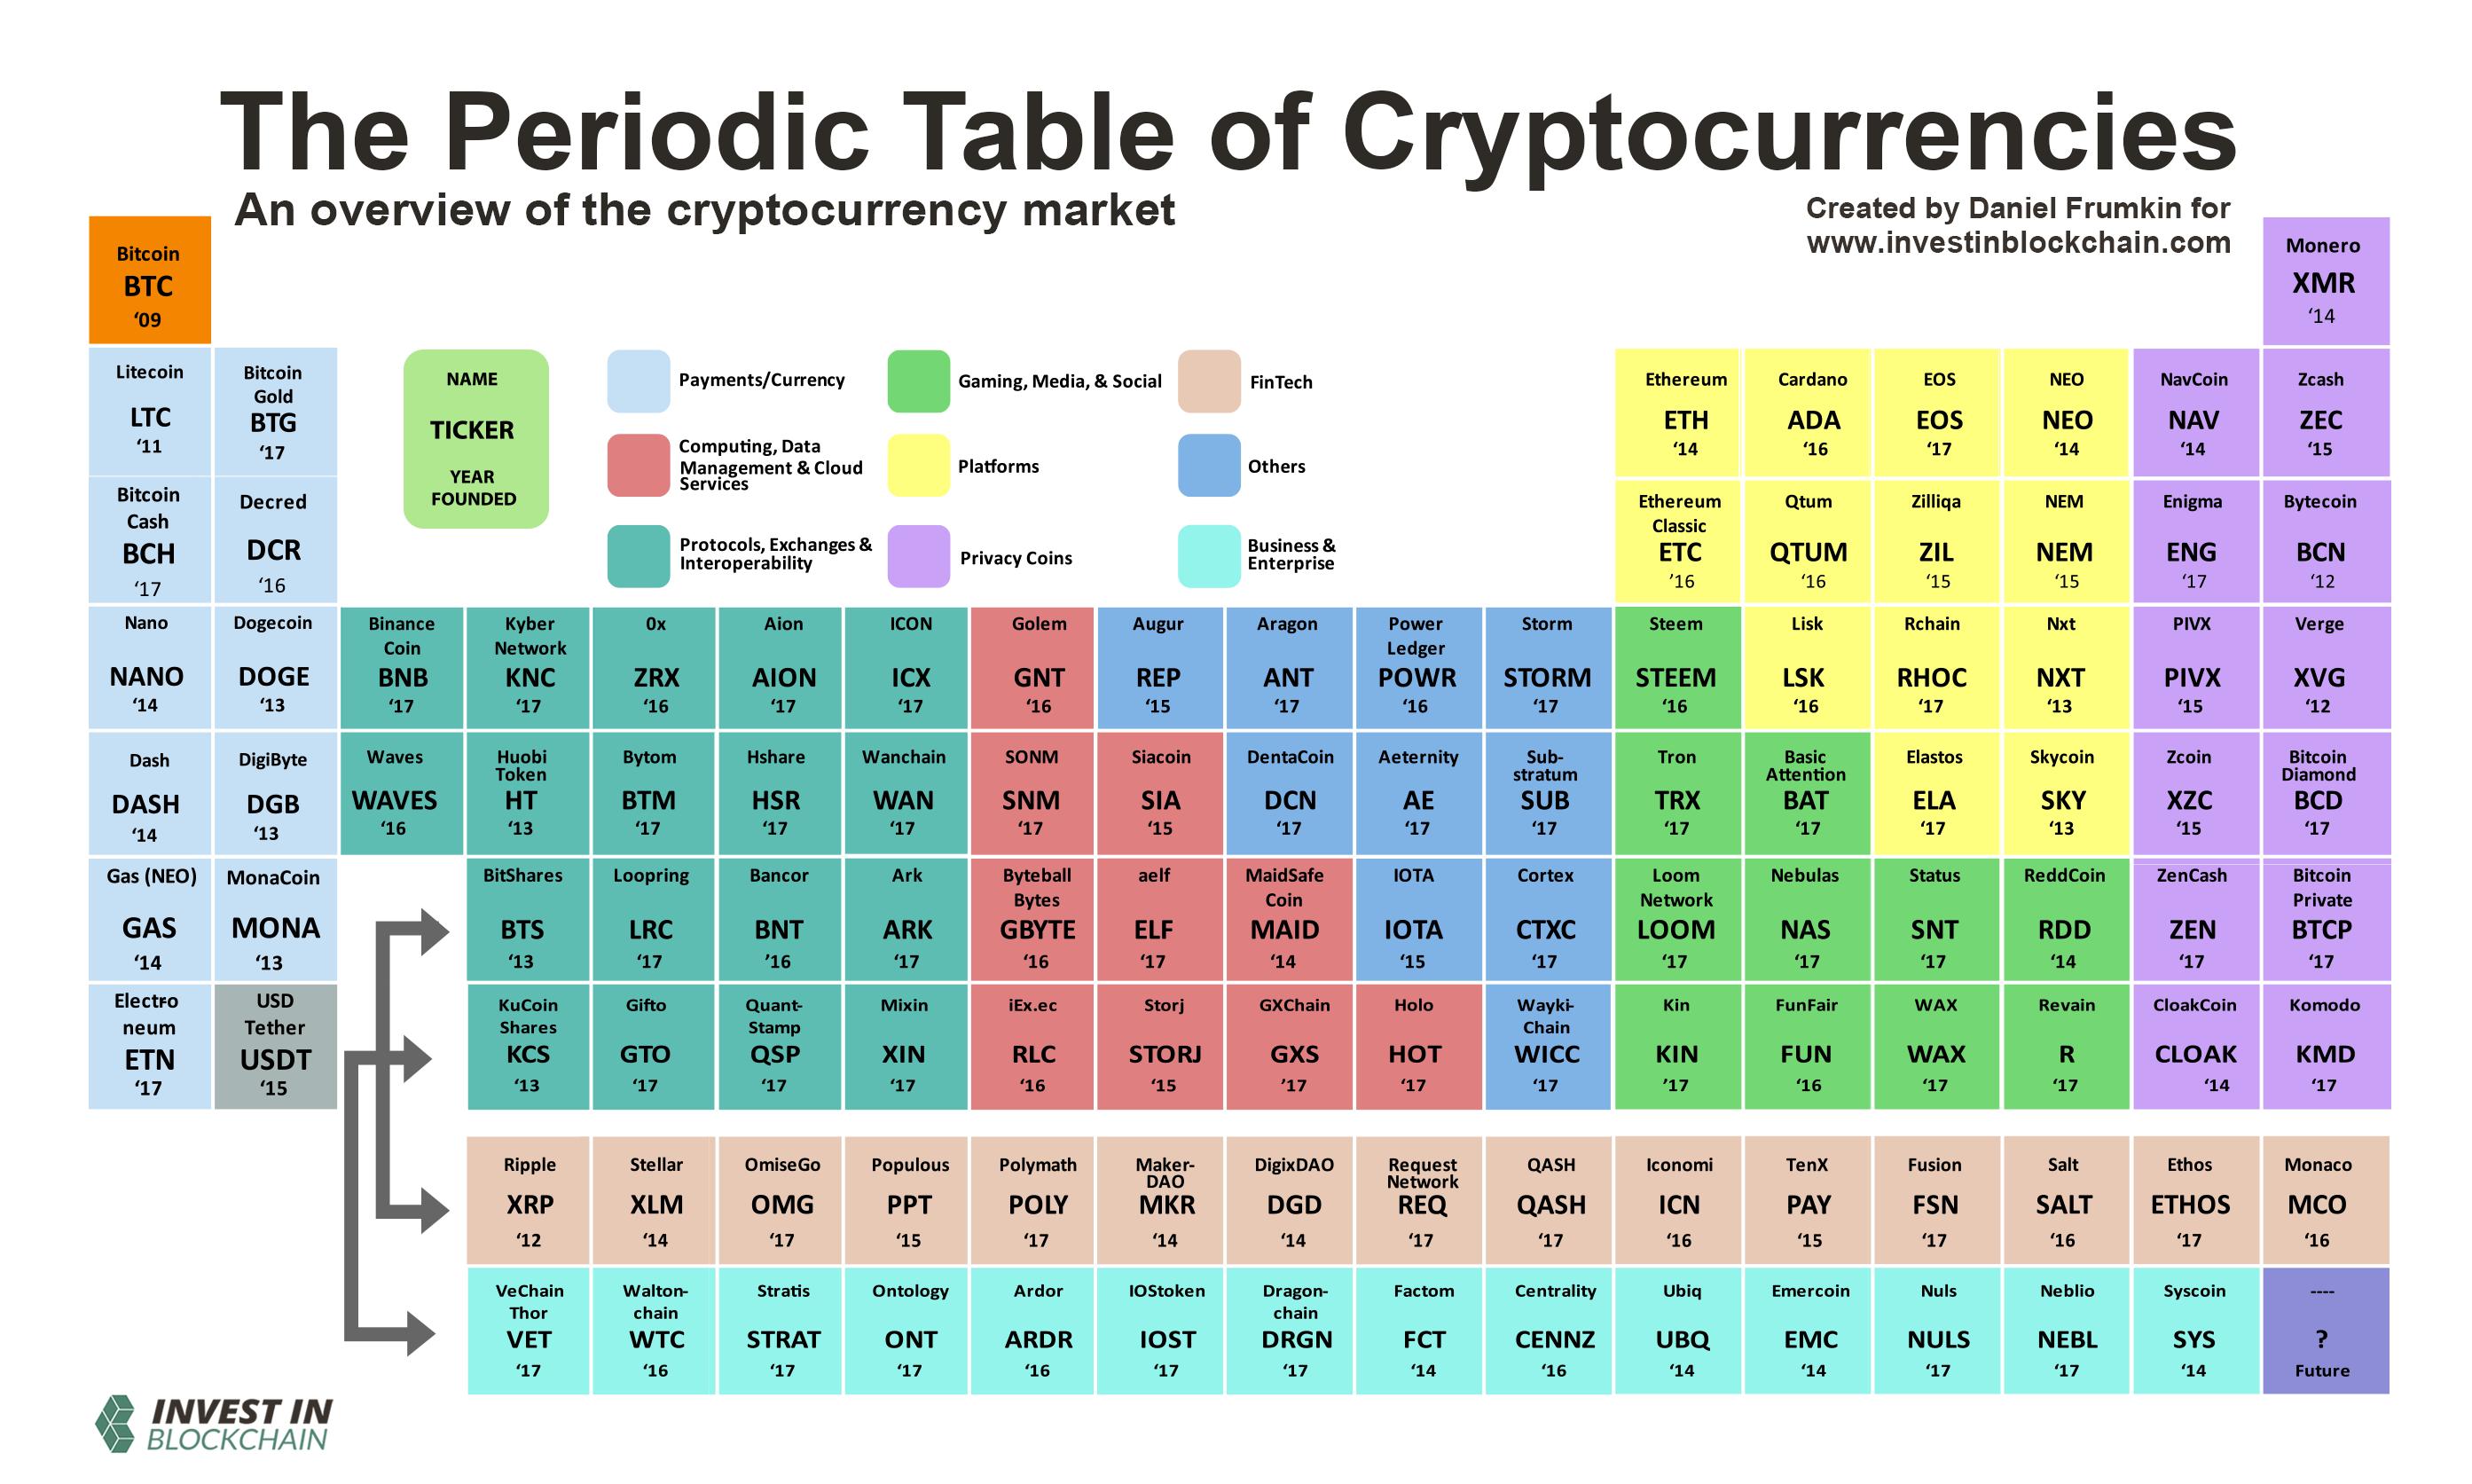 Bảng phân loại cryptocurrency